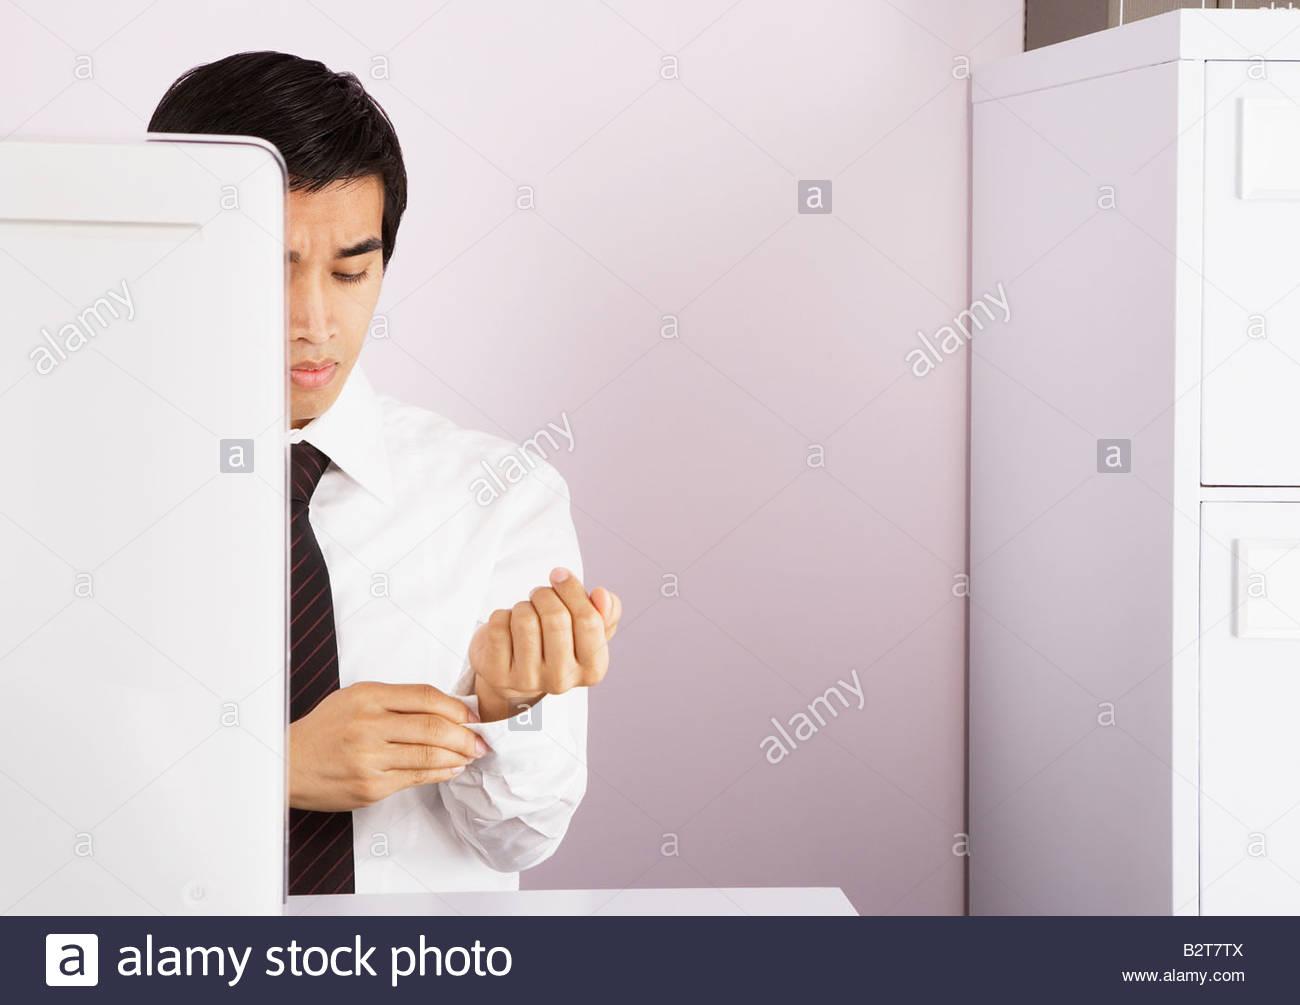 Businessman fastening his shirt cuff - Stock Image